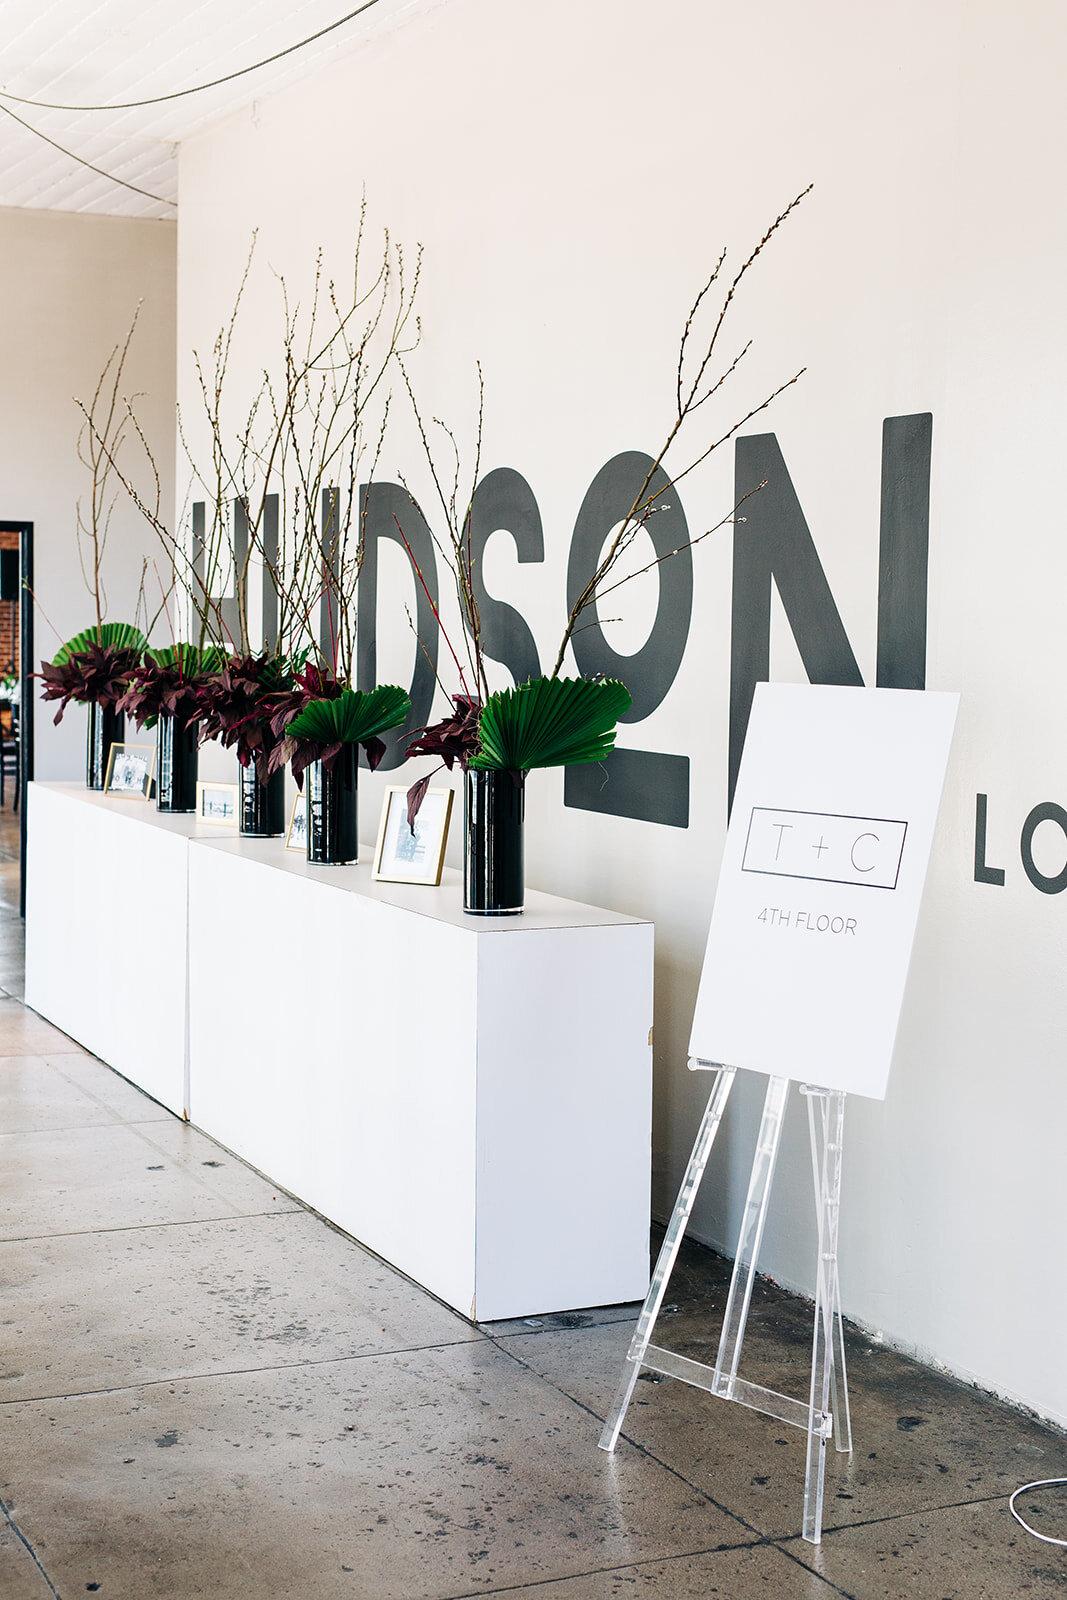 Tom-and-Christine-Hudson-Loft-Downtown-Los-Angeles-Brandon-J-Ferlin-Wedding-Photography-6.jpg